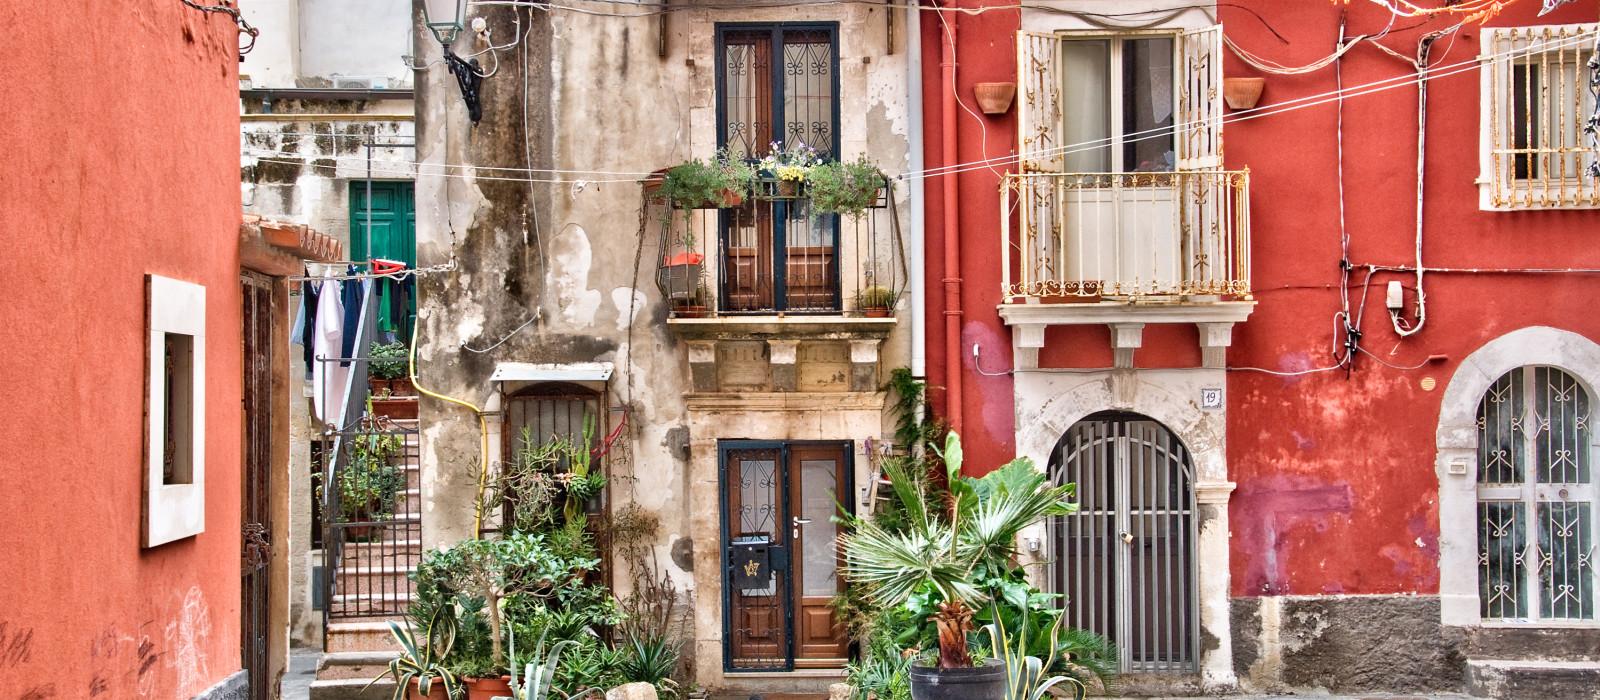 Destination Syracuse Italy